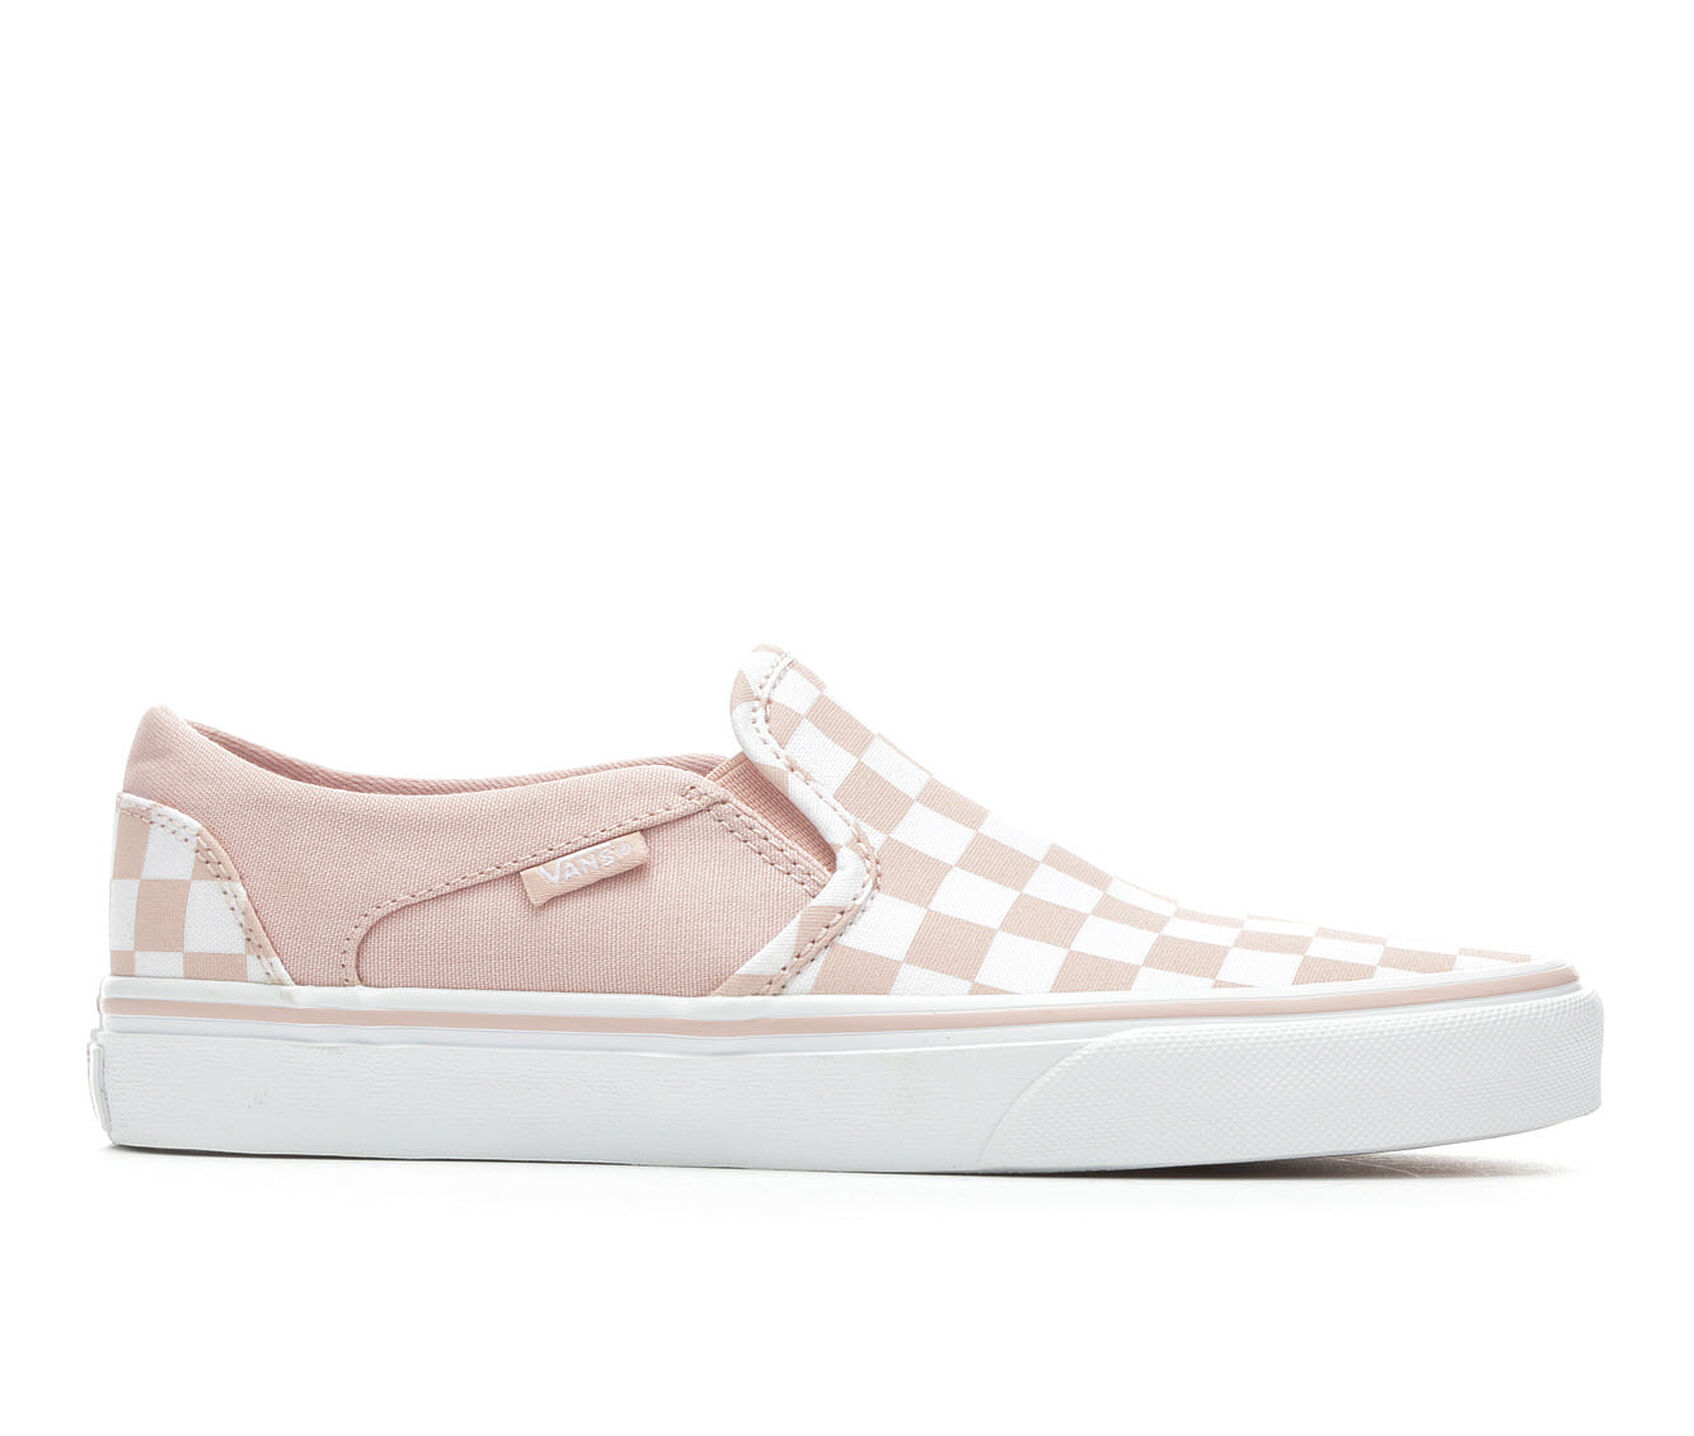 ... Vans Asher Slip-On Skate Shoes. Previous f28519d62